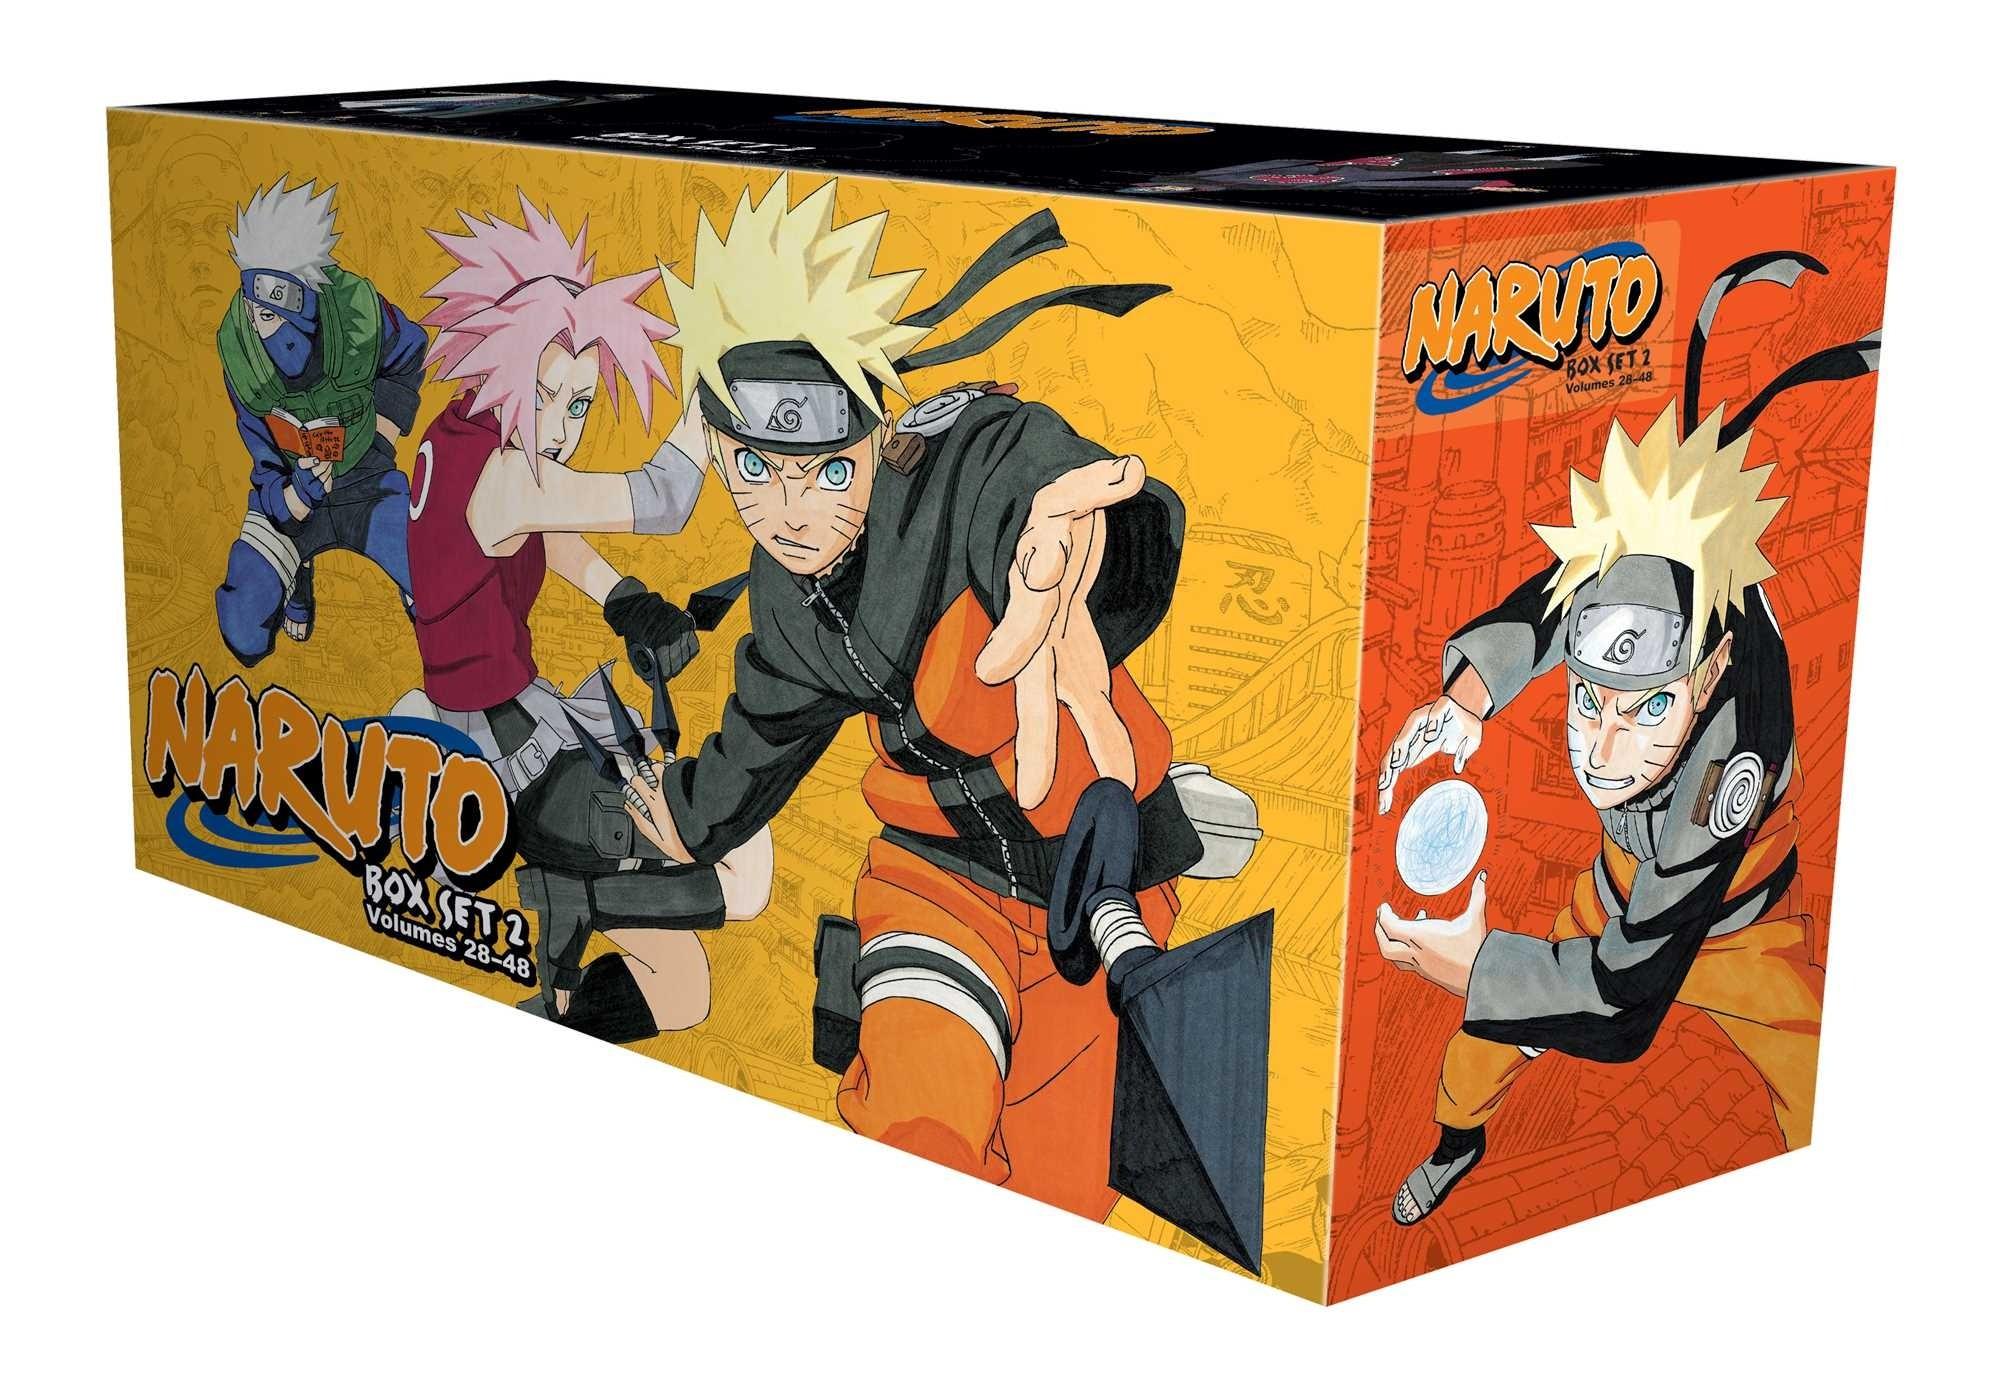 Naruto Box Set 2, (Volumes 28-48)